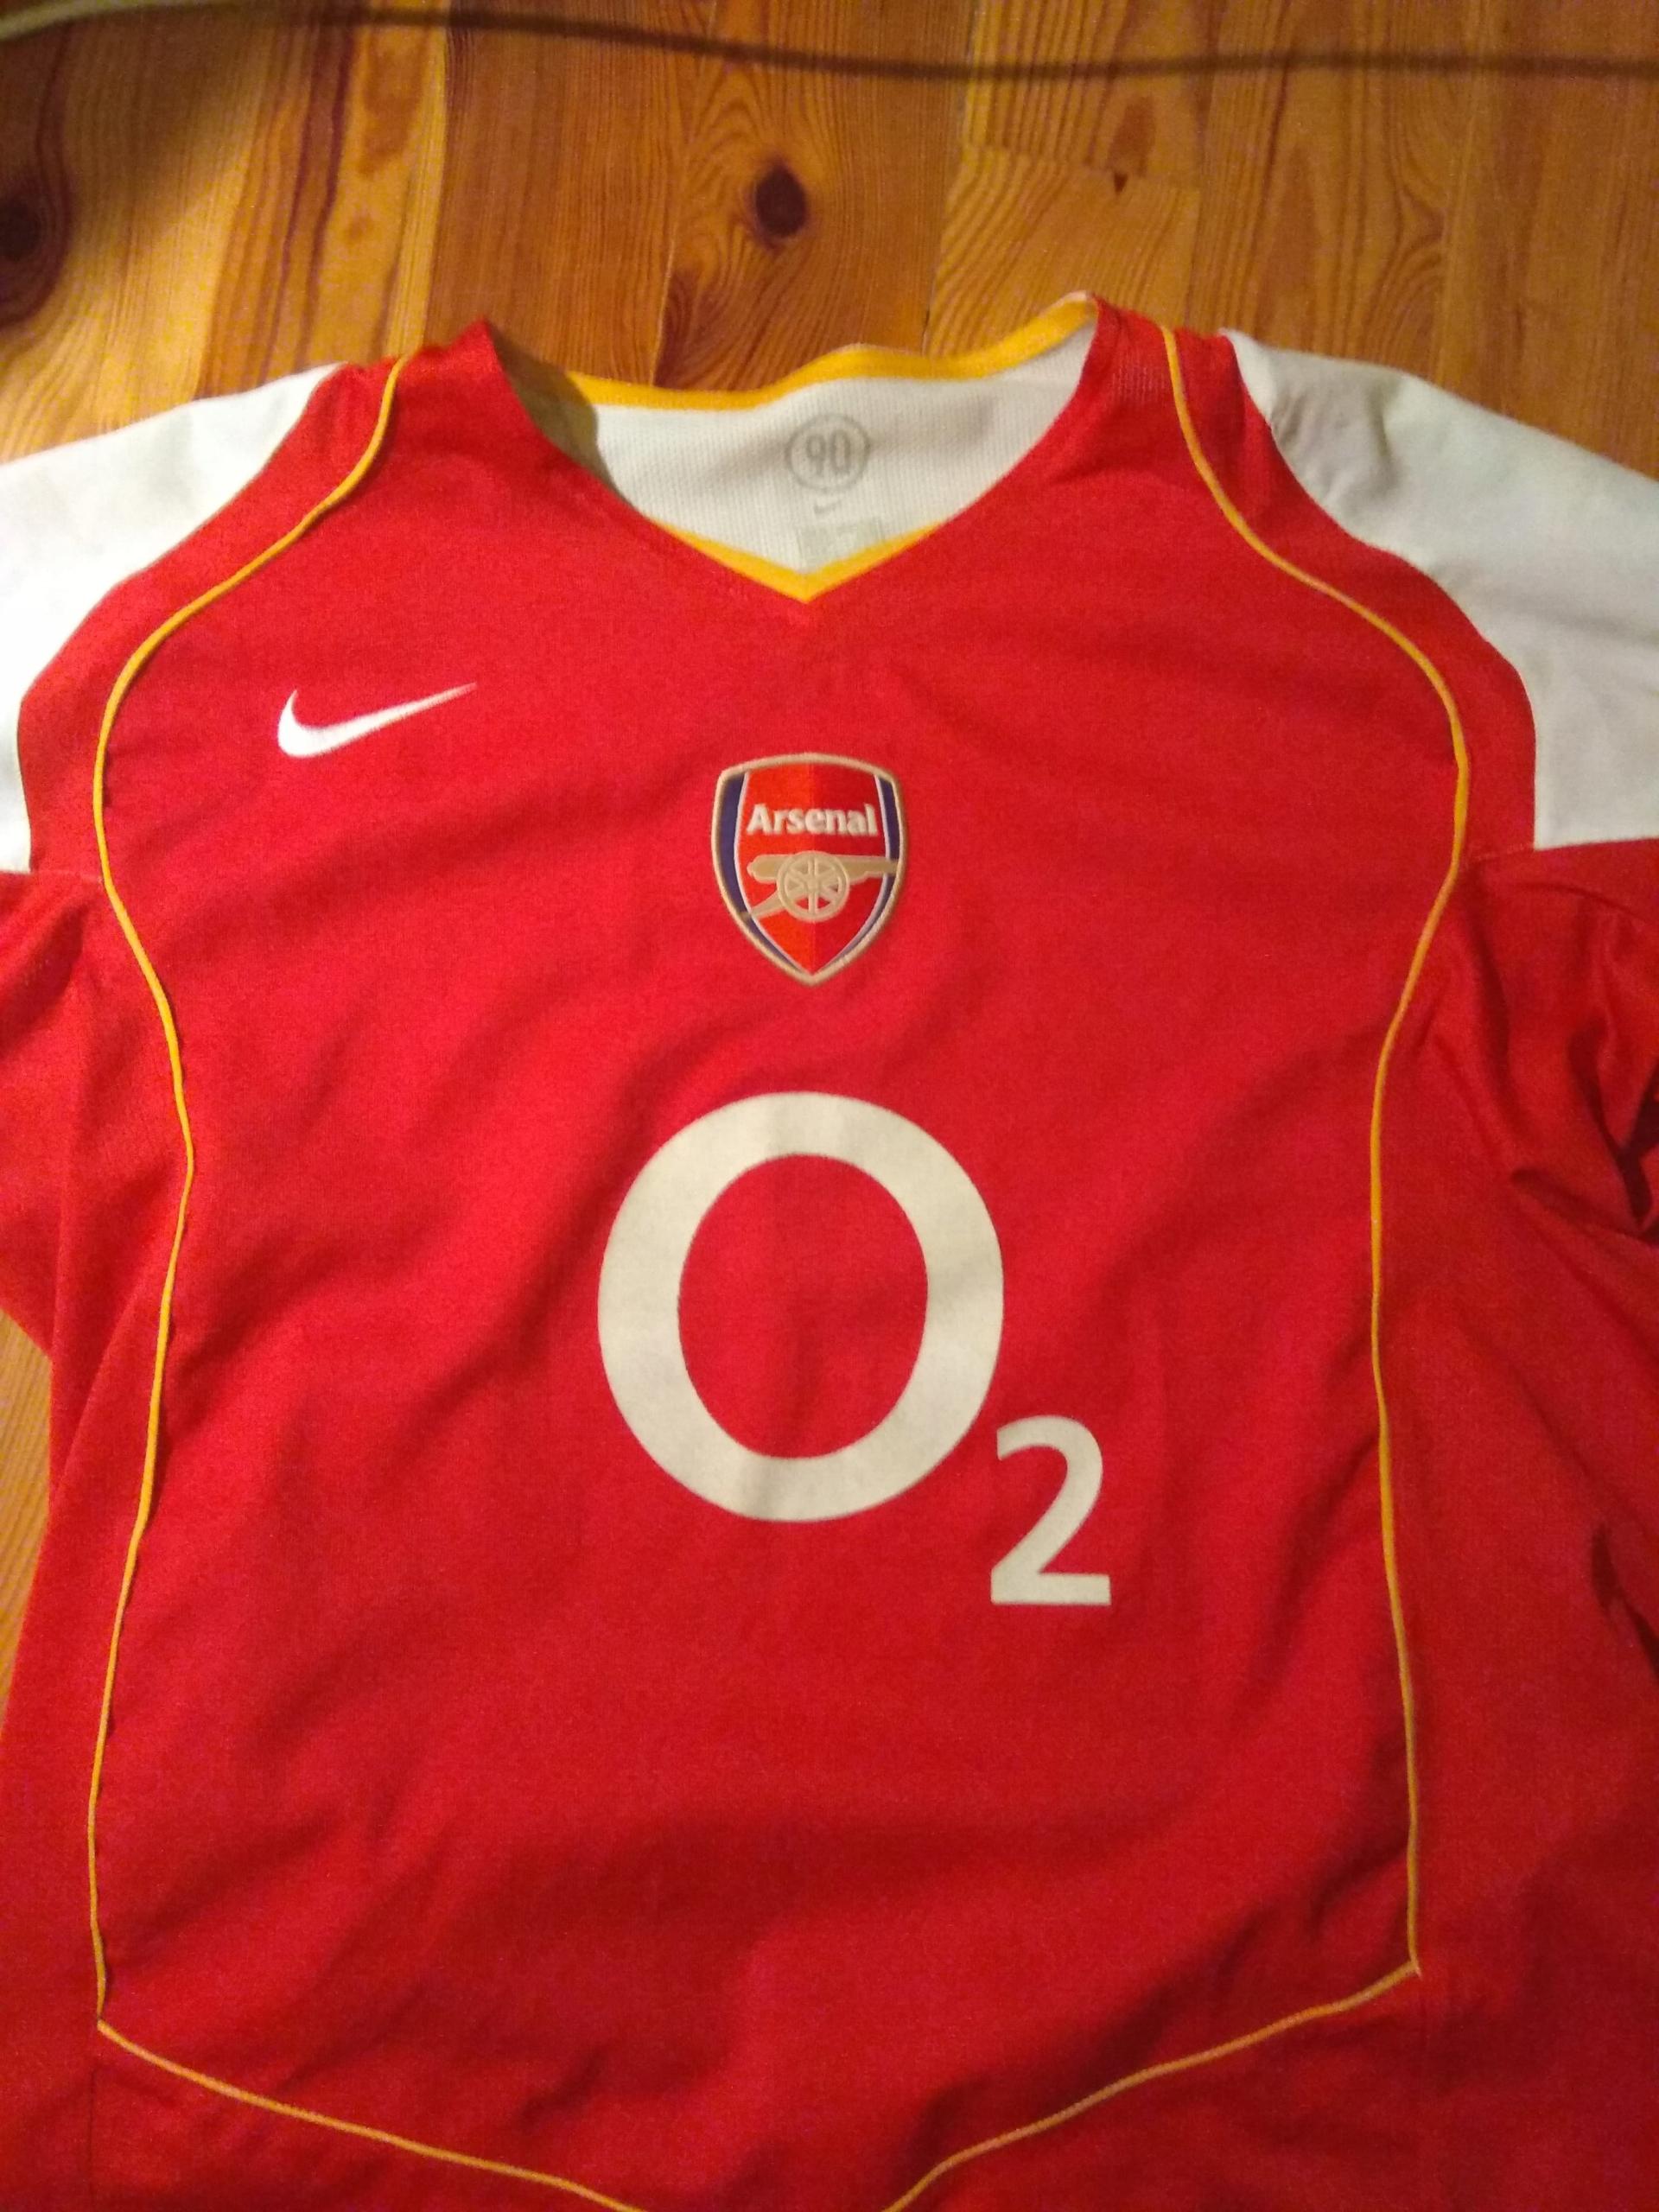 Koszulka Arsenal Londyn Nike XL 2004/05